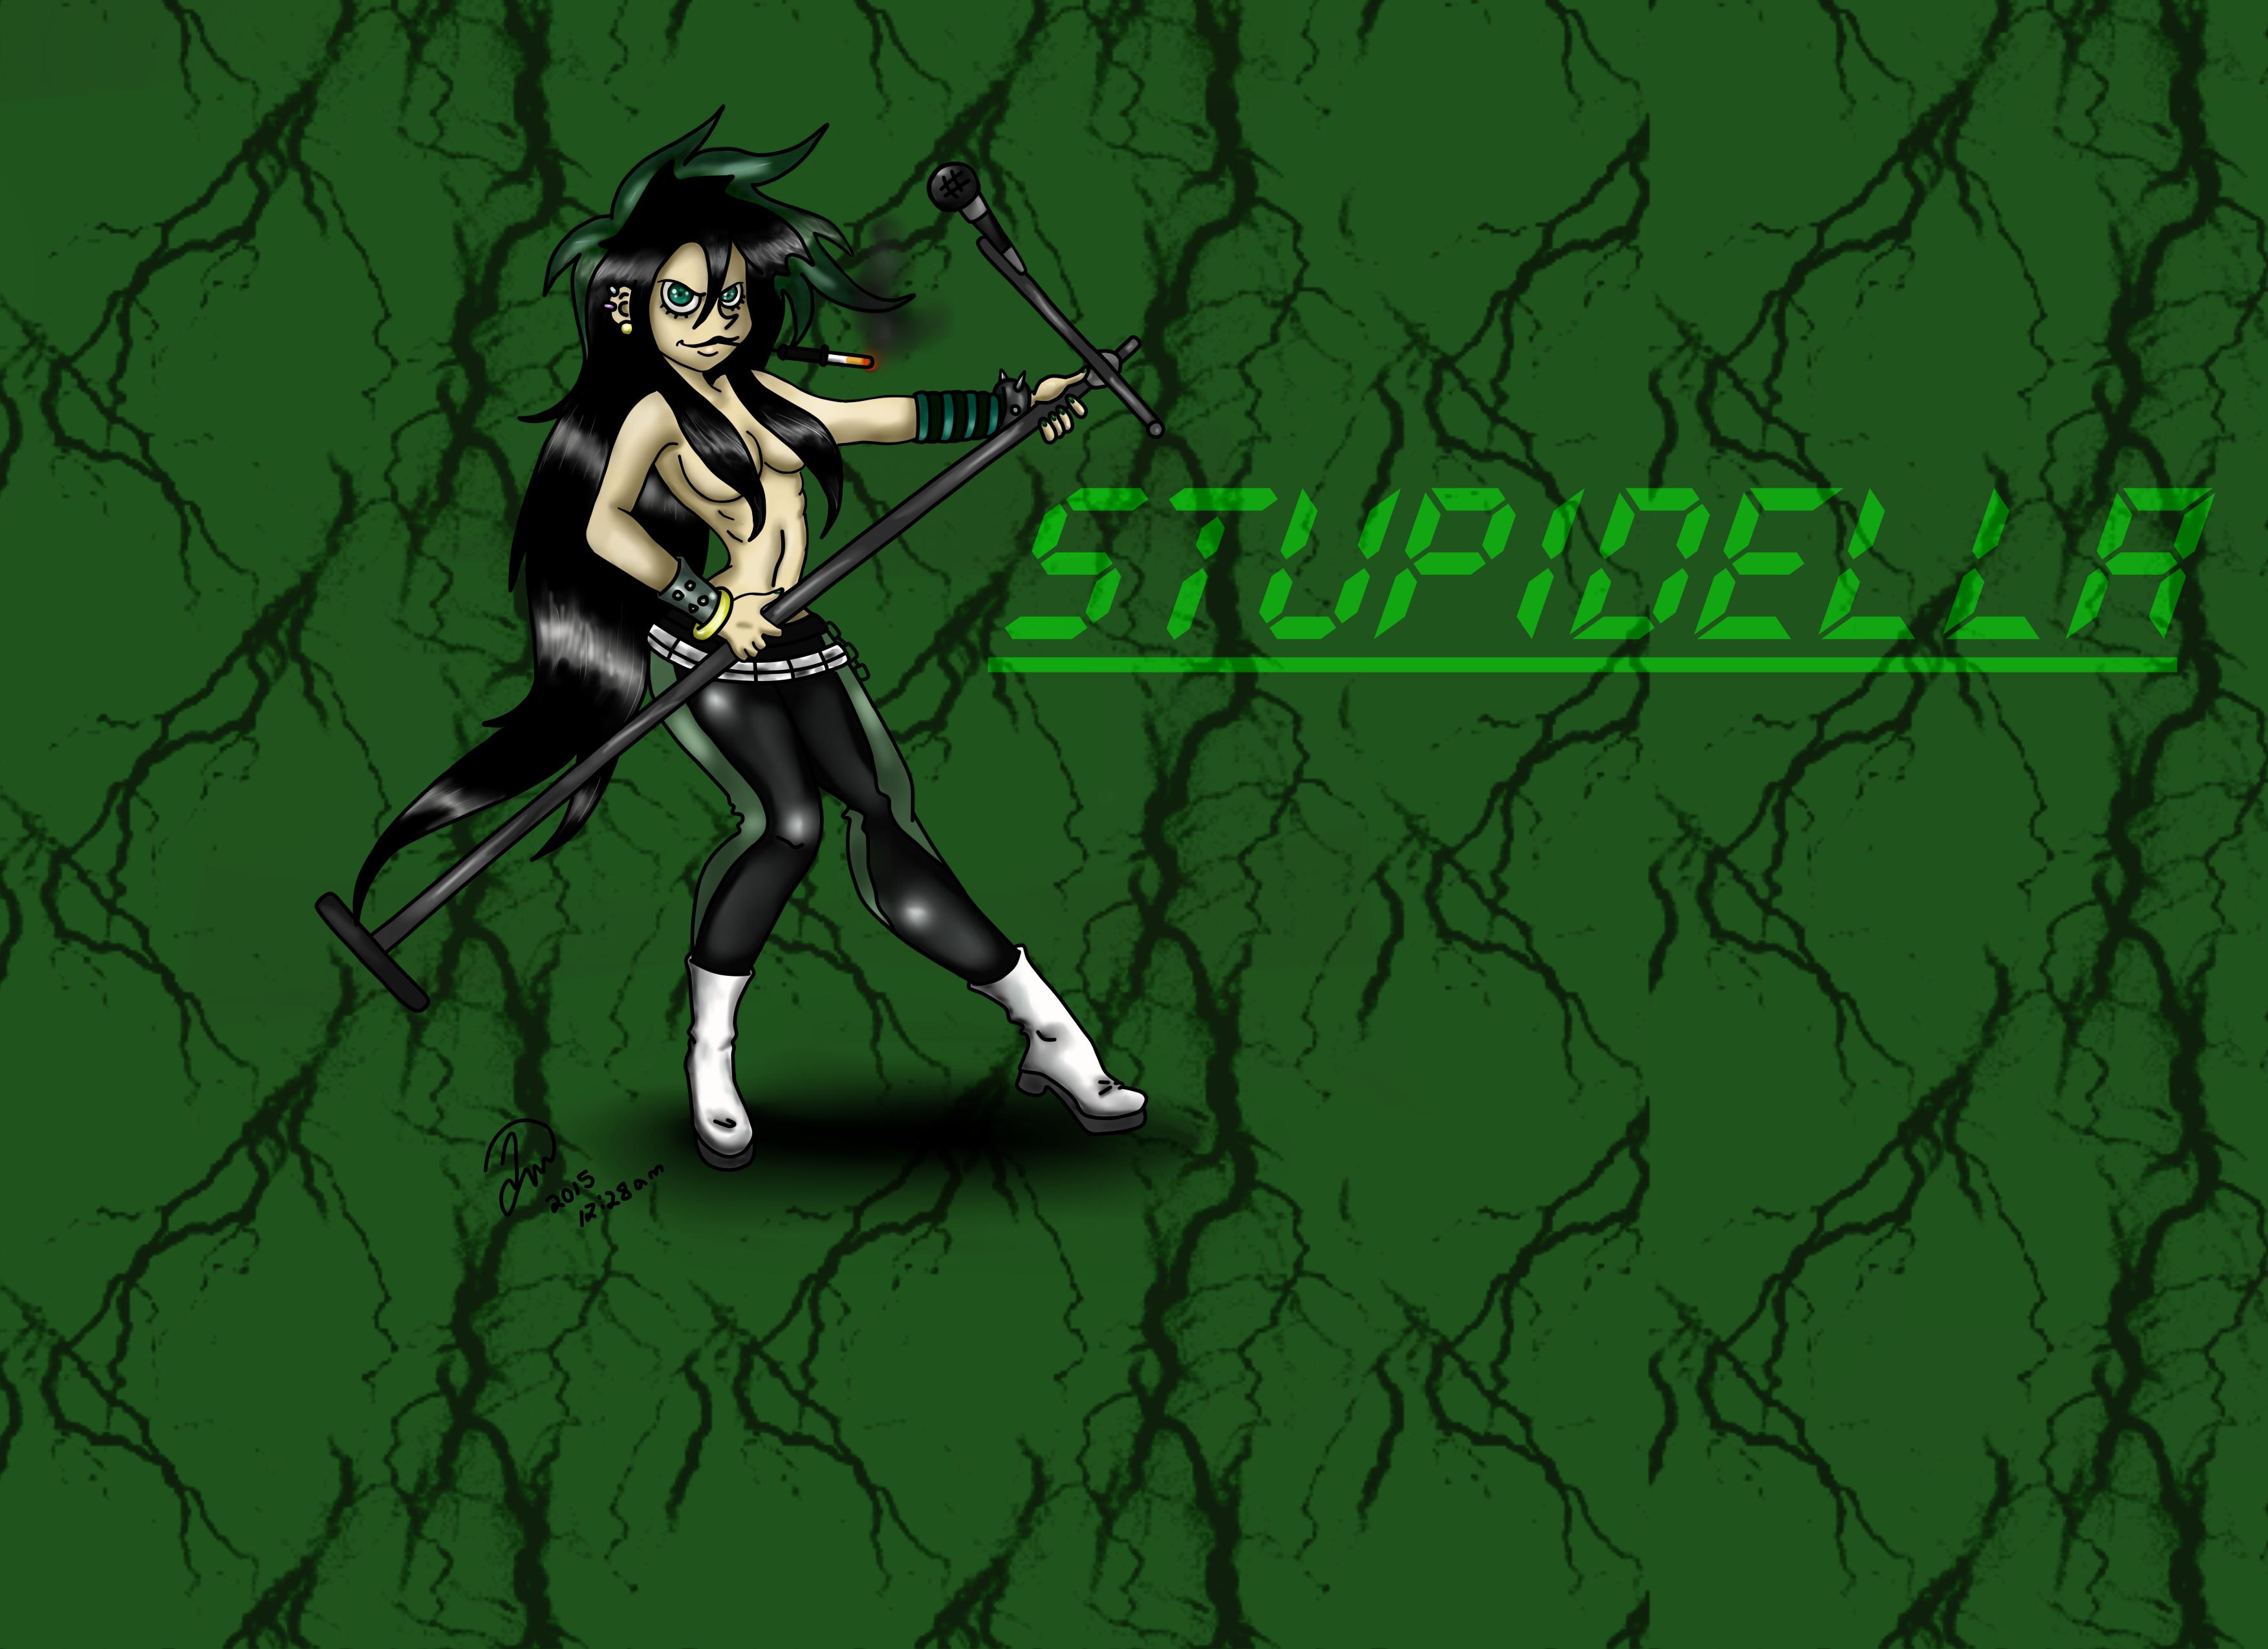 Stupidella